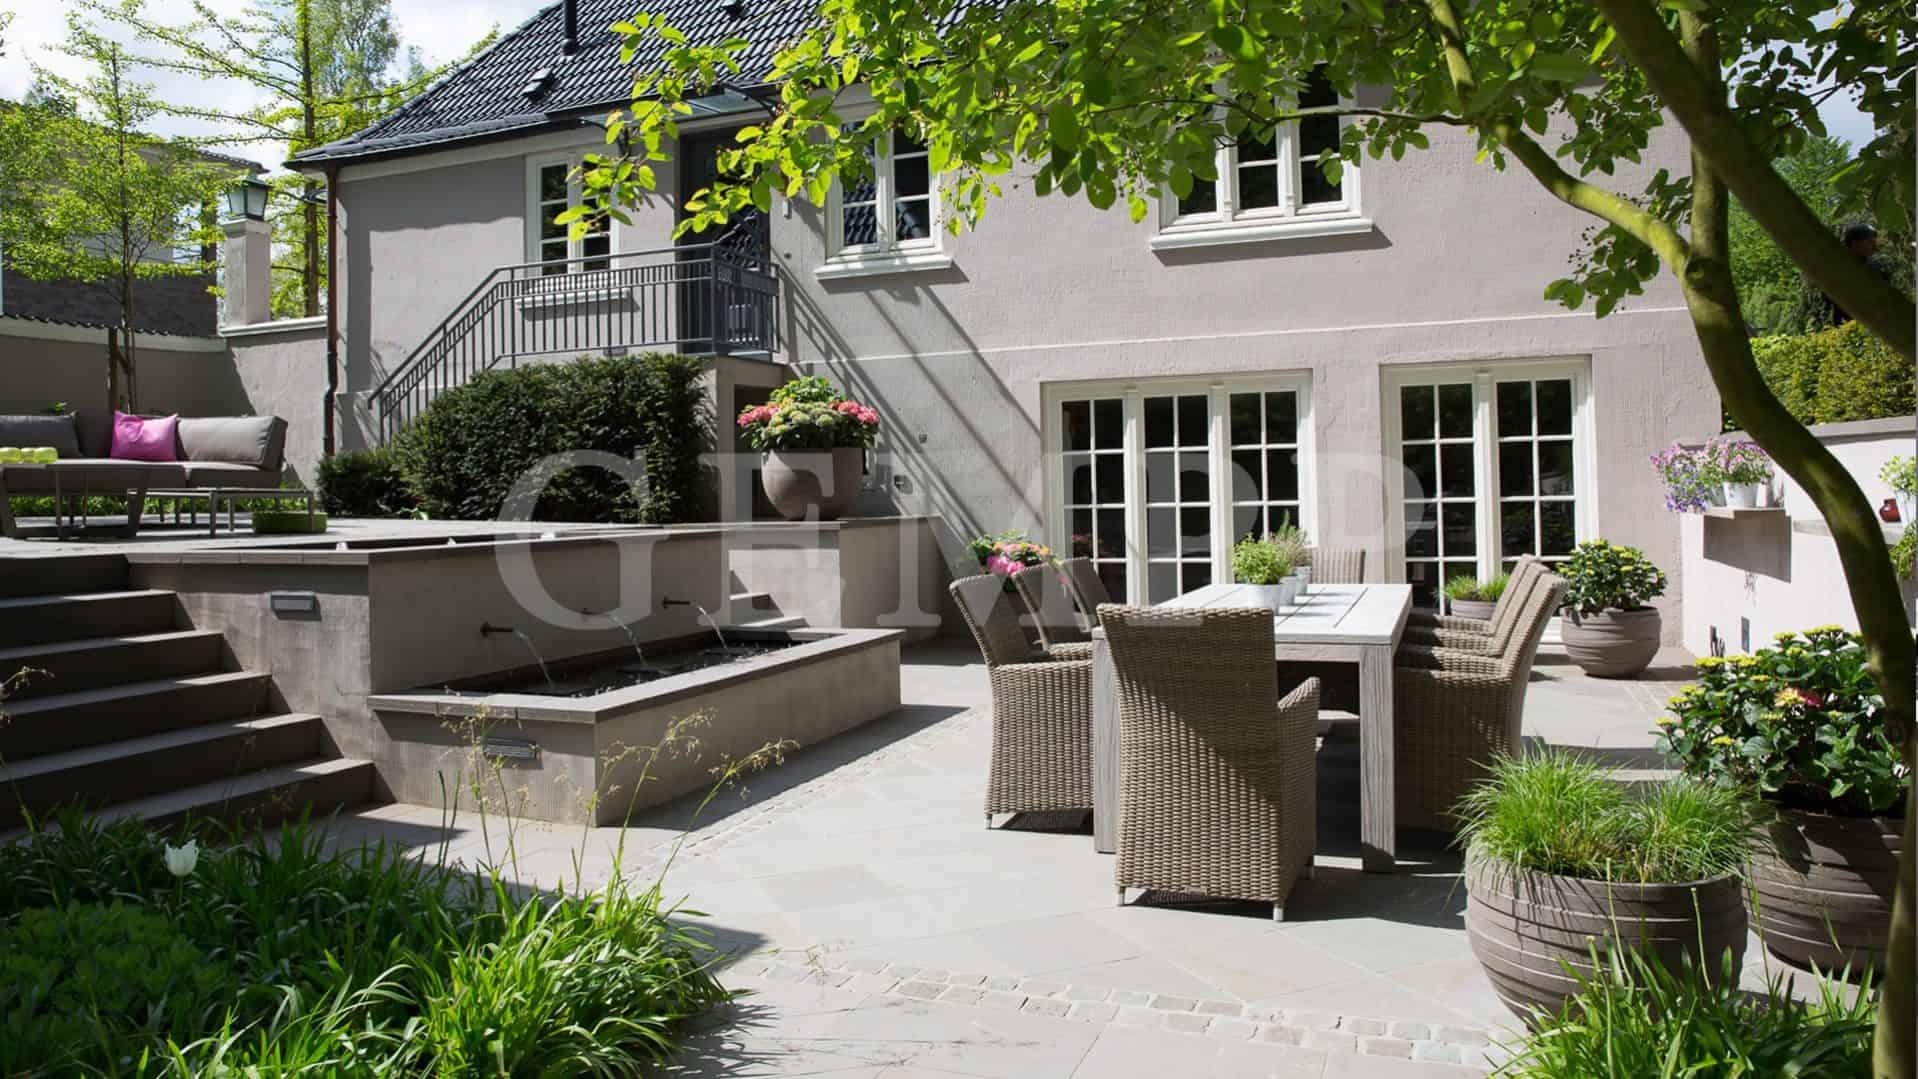 Atriumgarten anlegen gestalten moderner Patiogarten